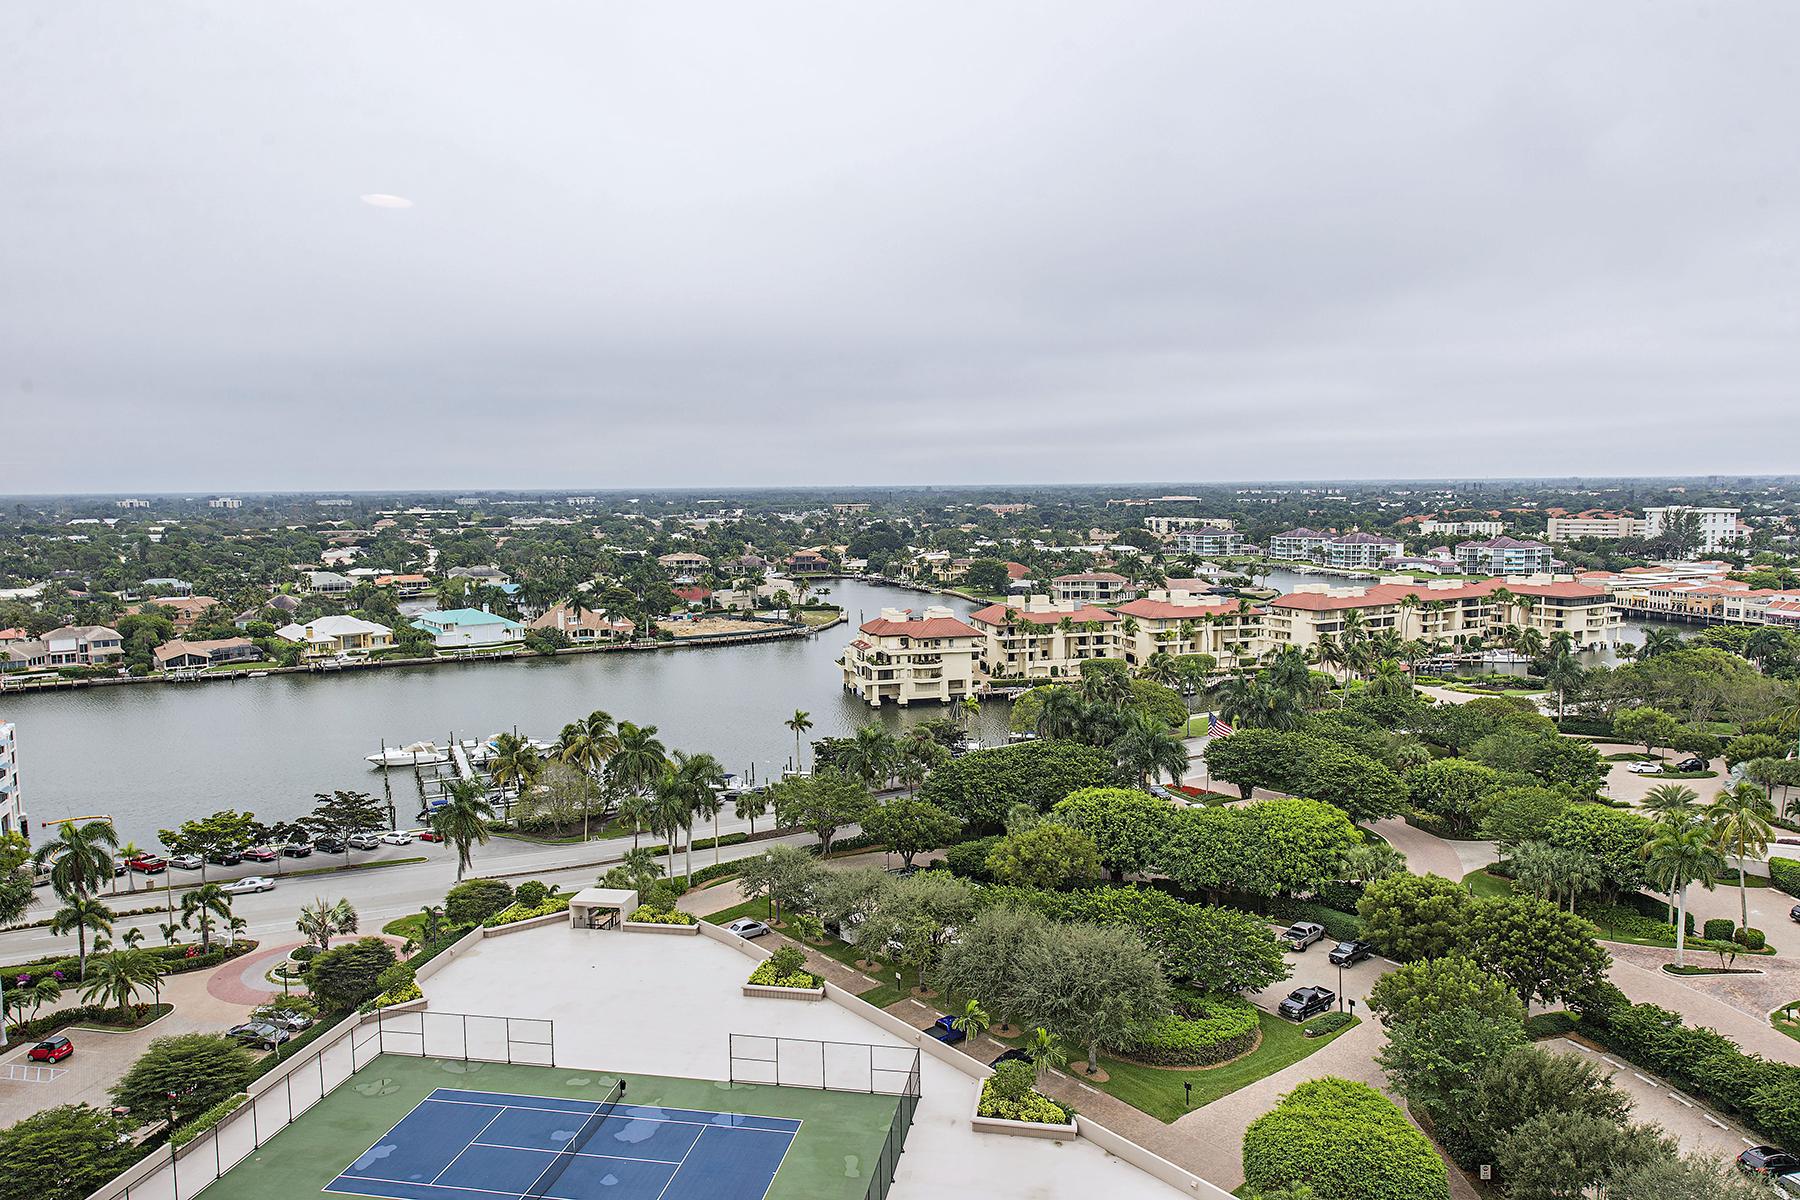 Condominium for Rent at MONACO BEACH CLUB - MONACO BEACH CLUB 4401 Gulf Shore Blvd N D1707, Naples, Florida 34103 United States